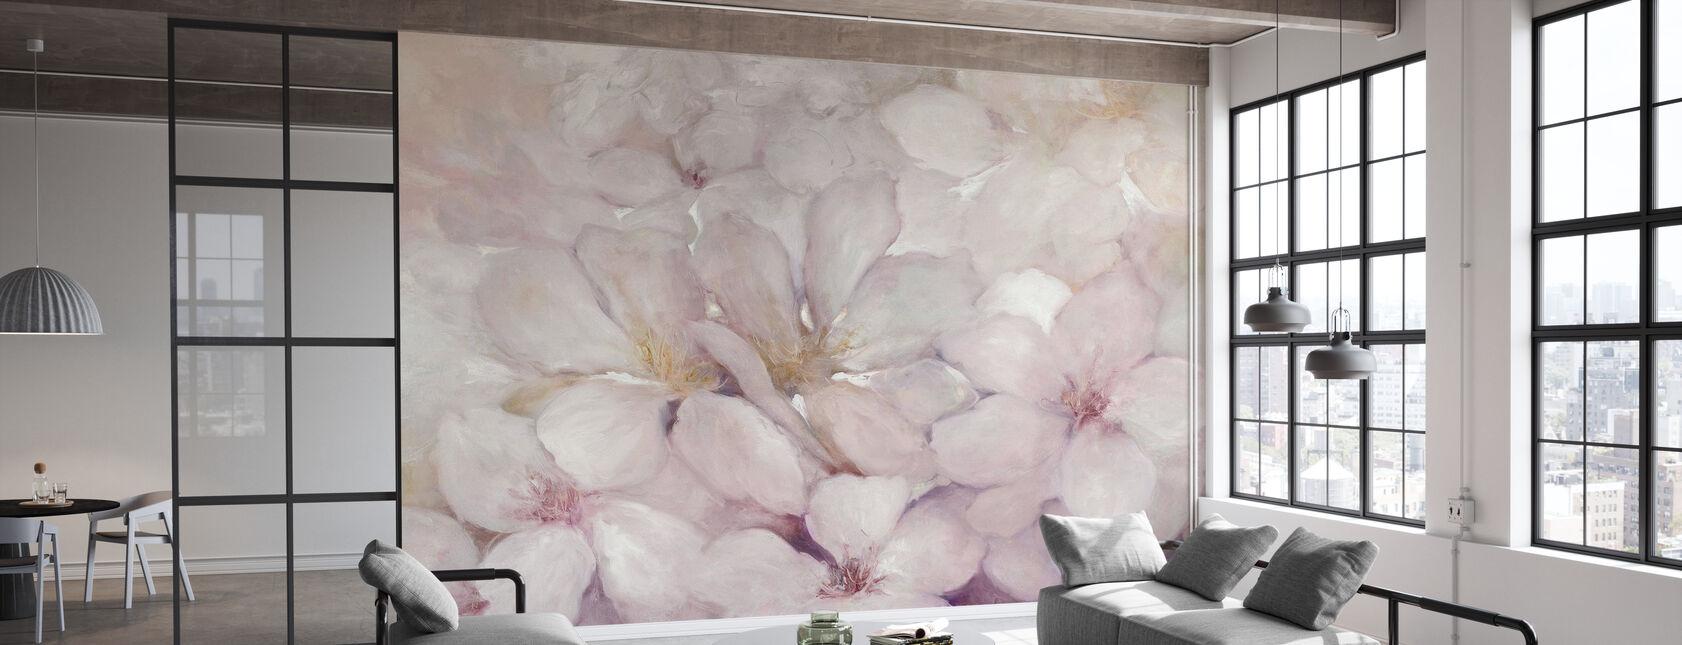 Apple Blossoms - Wallpaper - Office